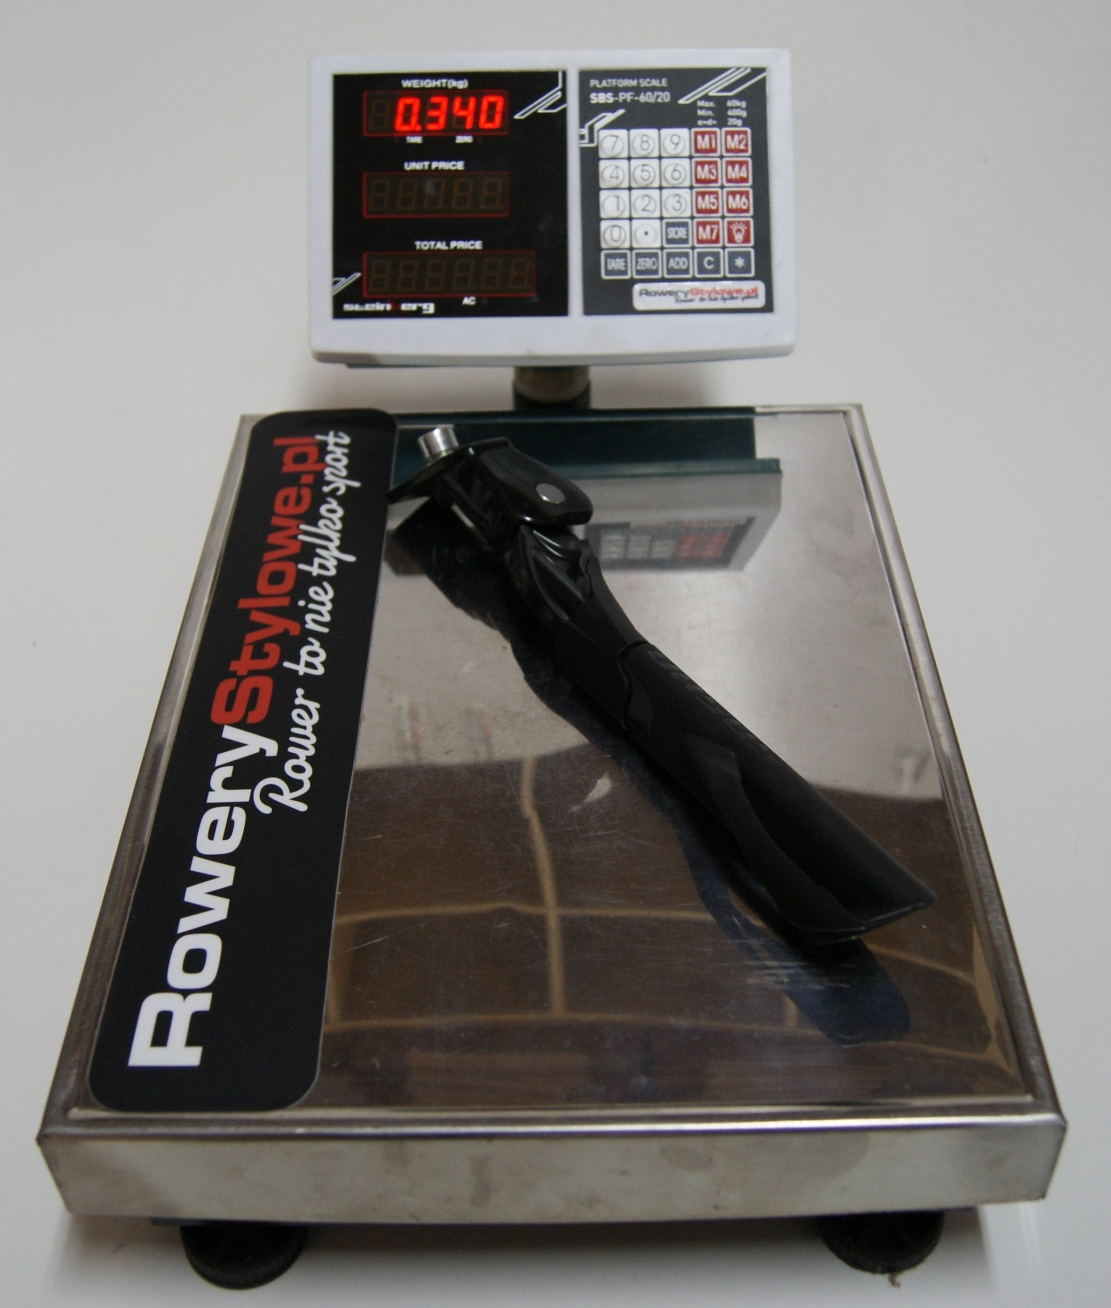 Nóżka rowerowa URSUS Wave 81 – 35 kg 340 gram